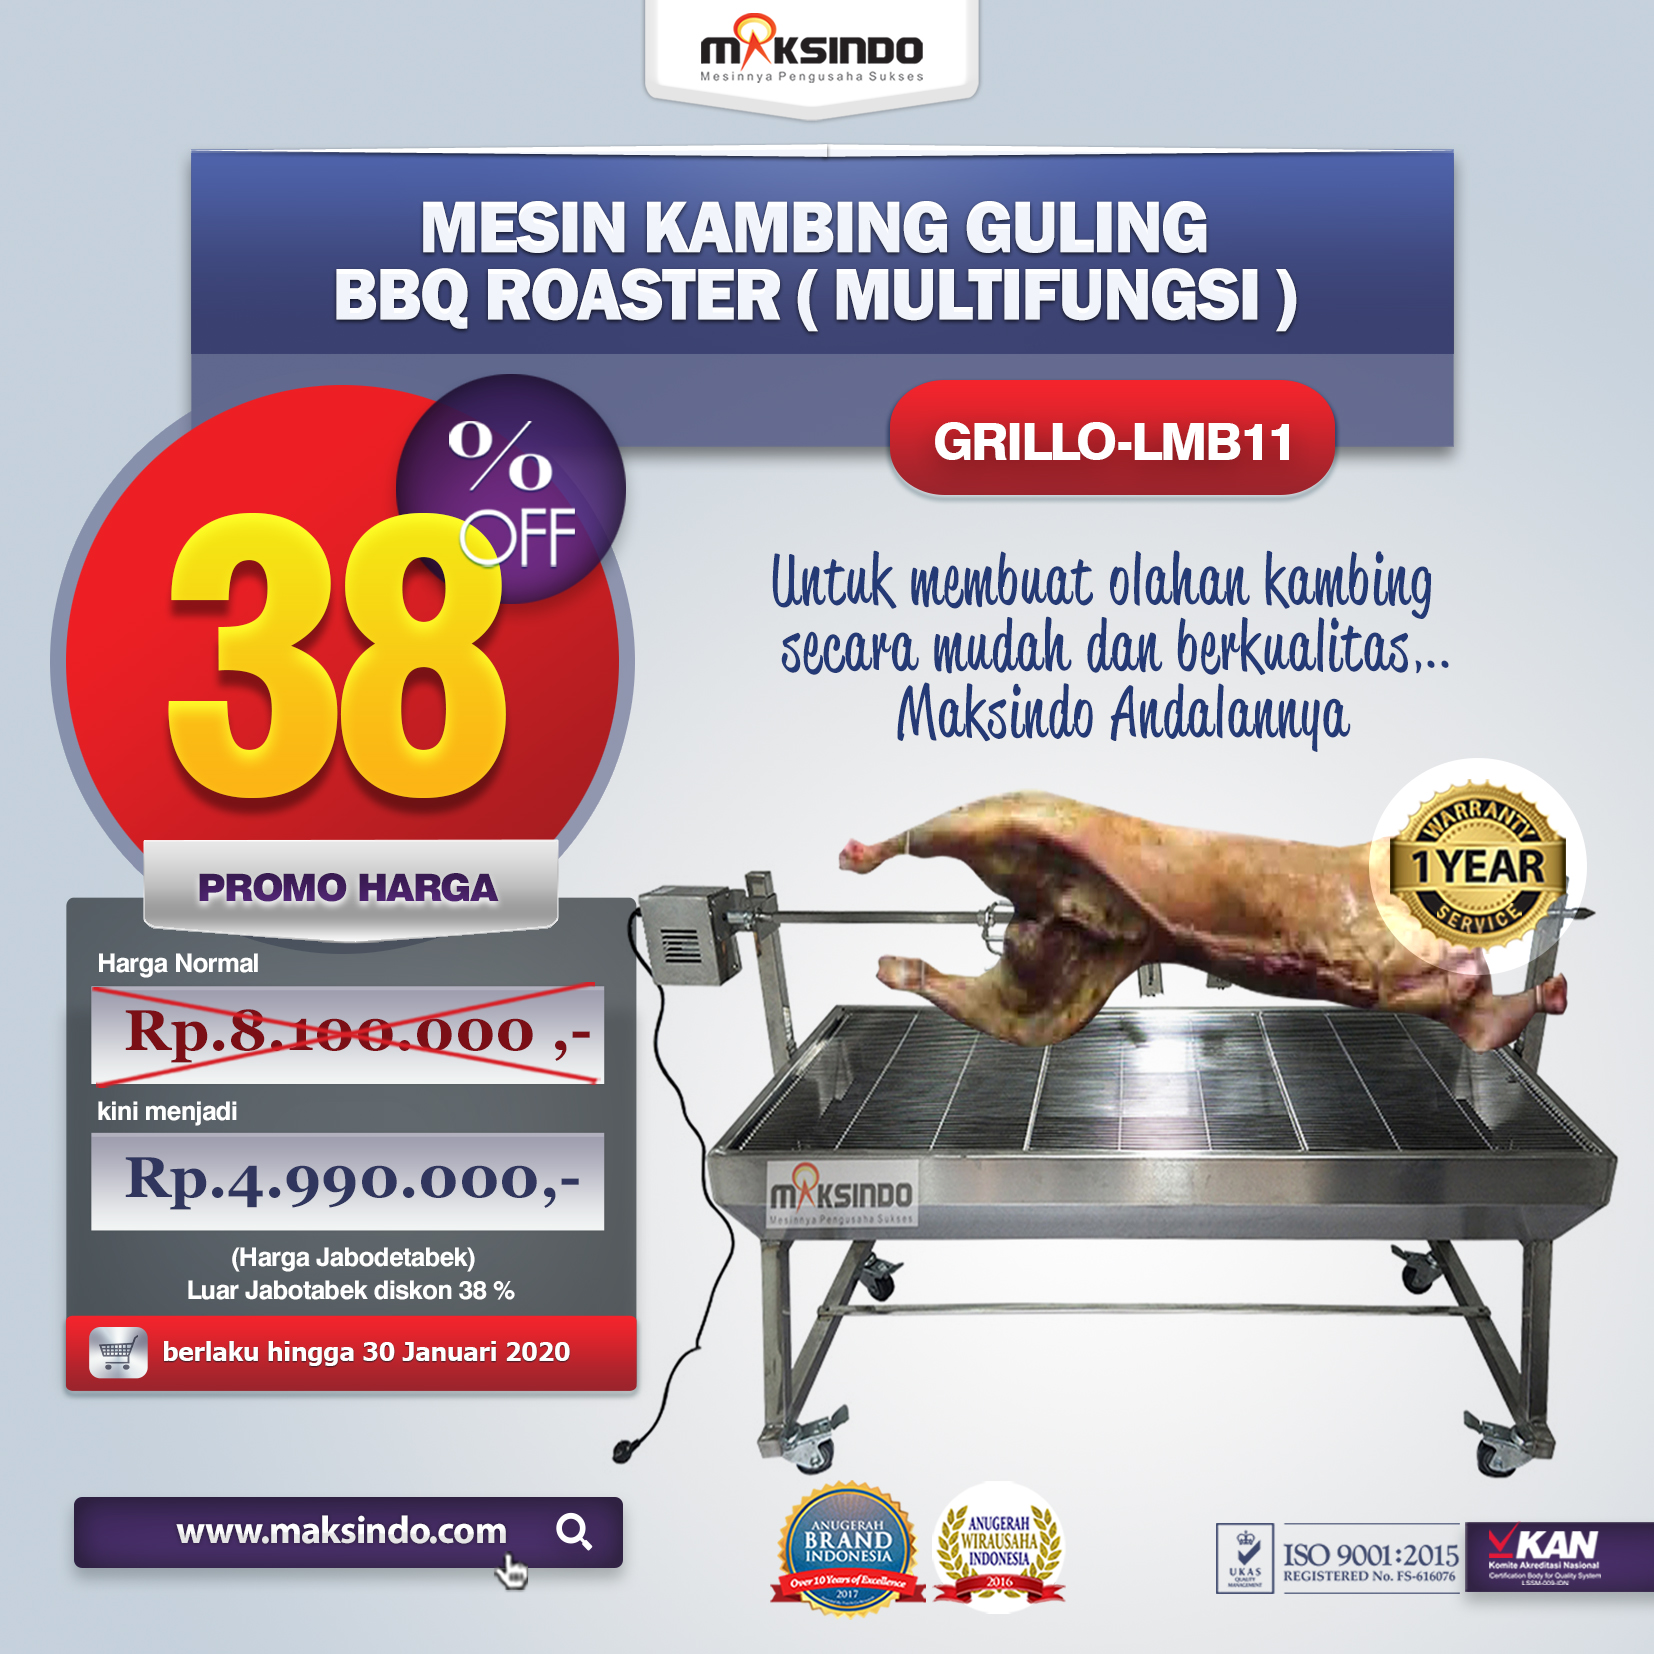 Jual Mesin Kambing Guling BBQ Roaster (GRILLO-LMB11) di Semarang